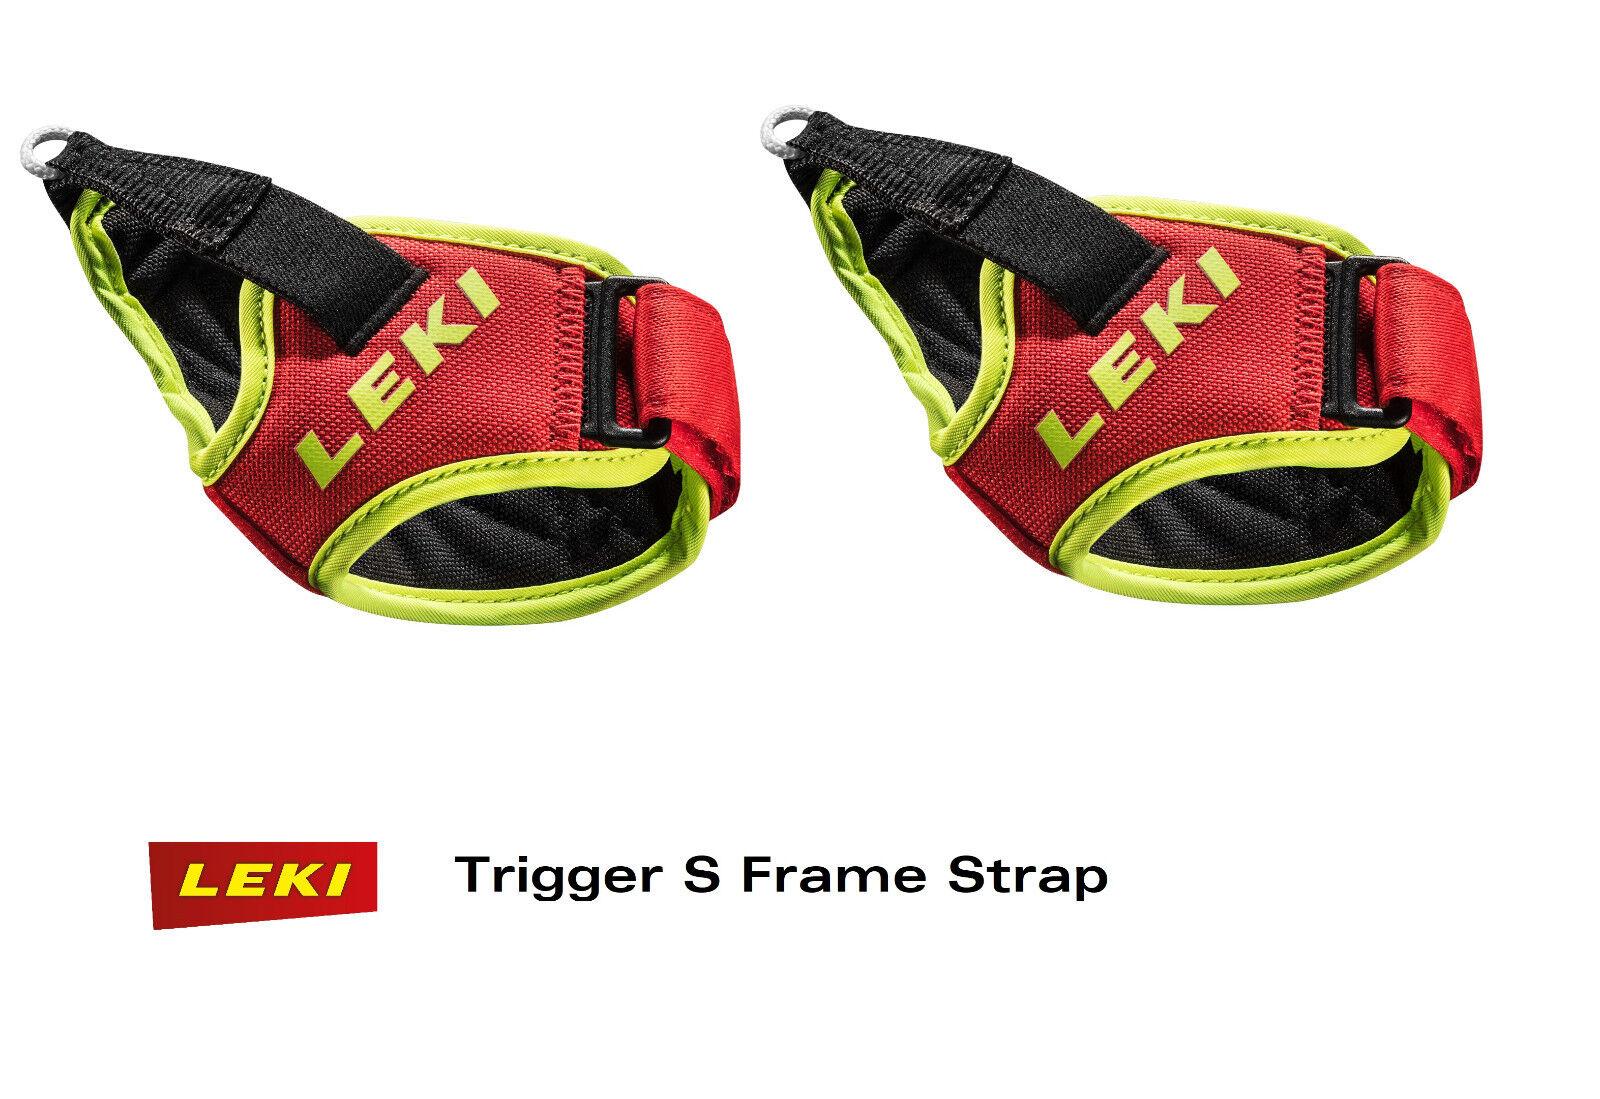 Leki frame Strap trabillas para Alpin ski palos disparador disparador disparador S - 1 par-racing rojo f88a04